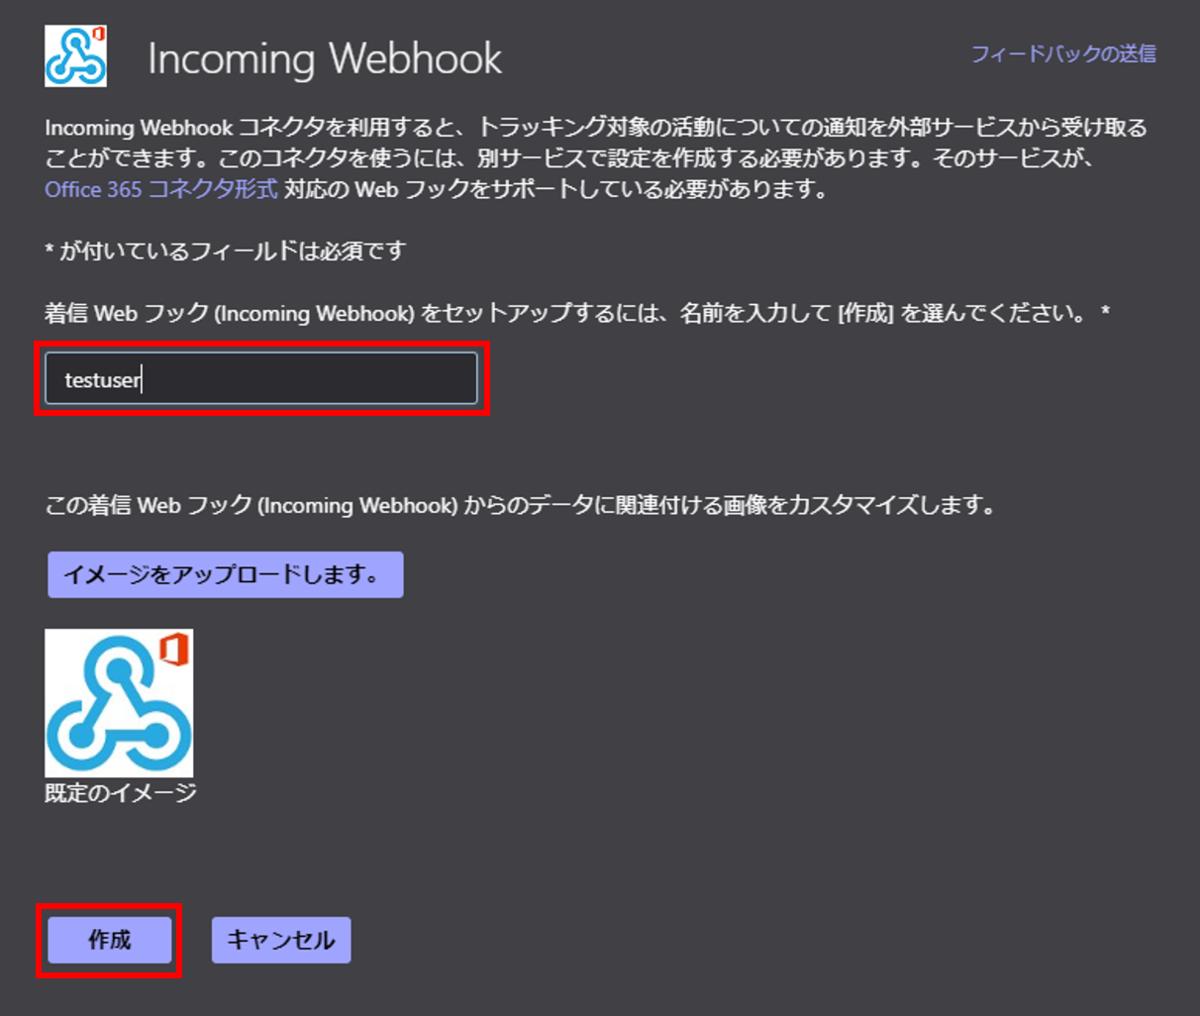 Incoming Webhook設定